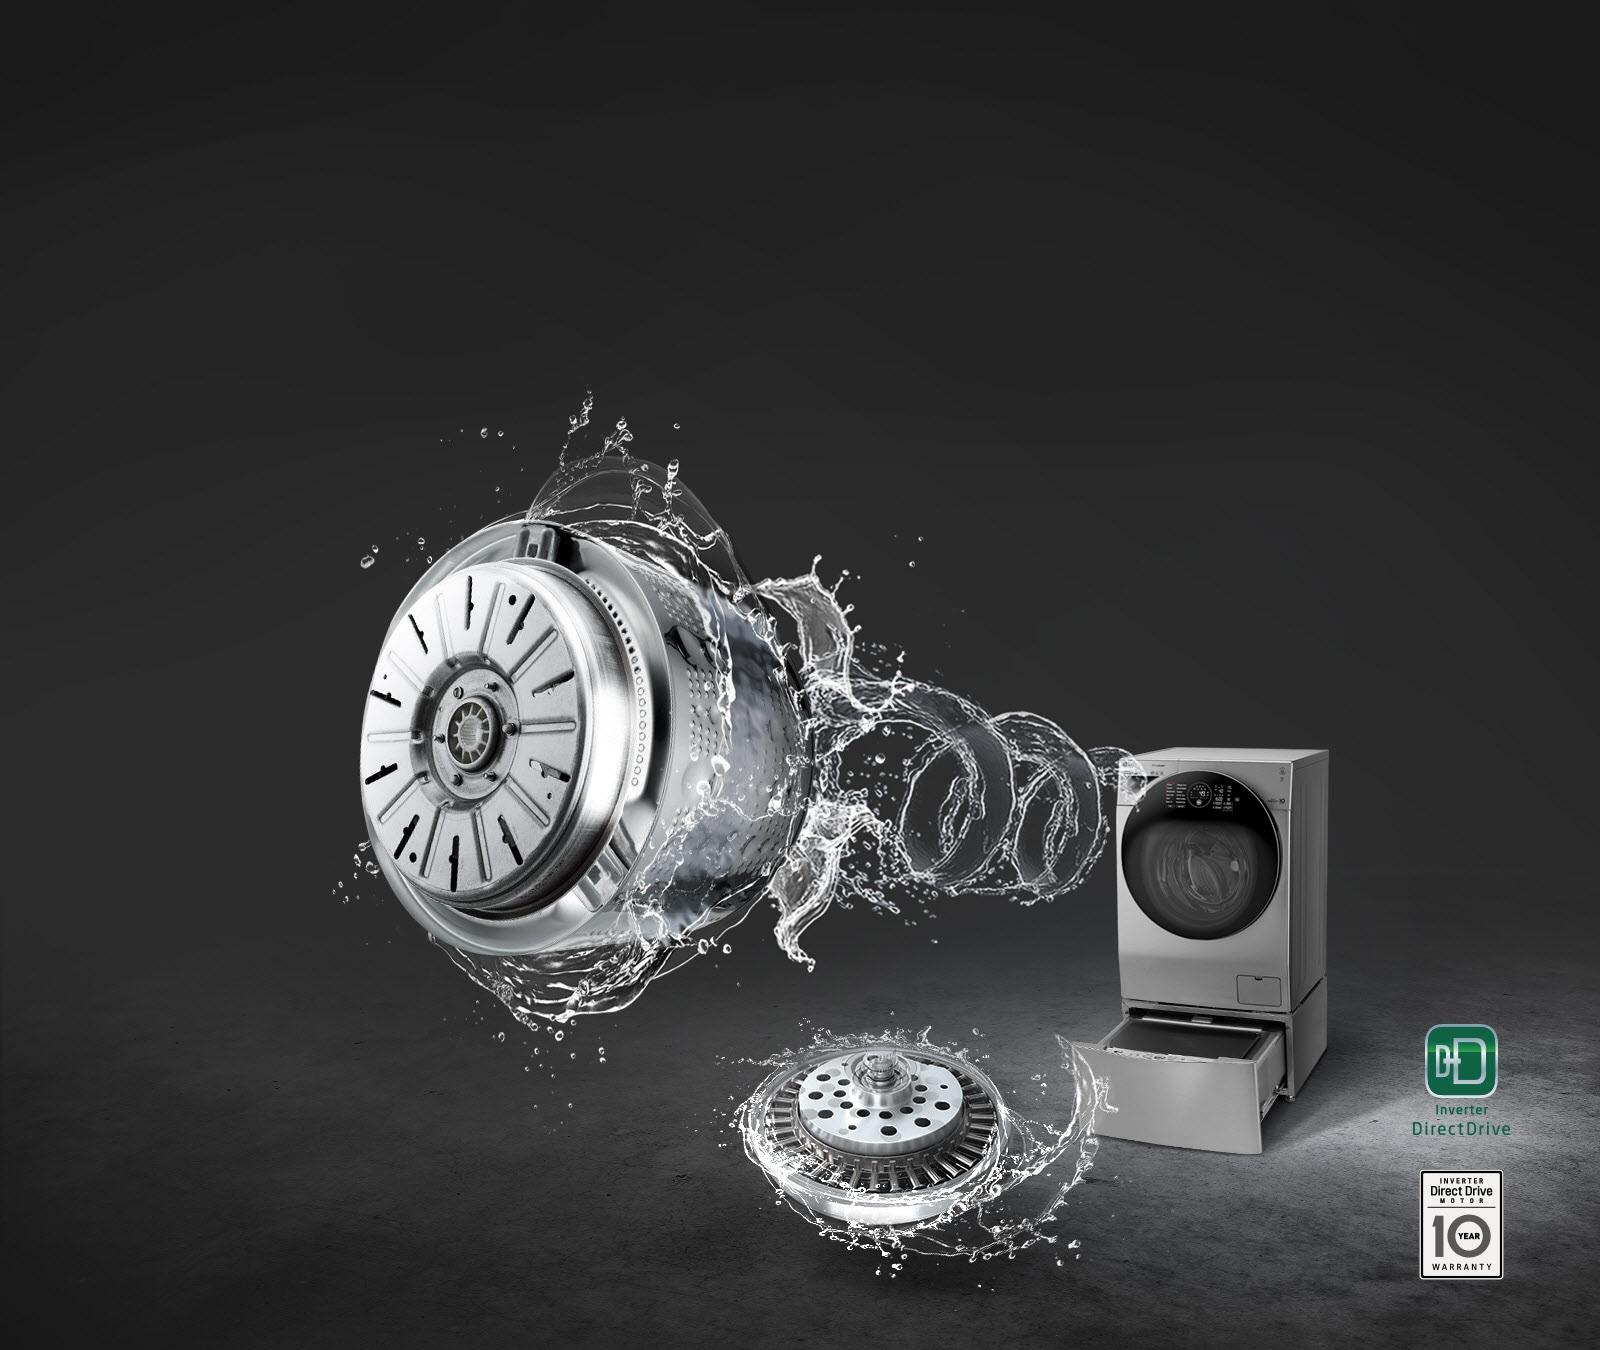 Global_TWINWash24_Gplus_Washer&Dryer_VCM_2018_Feature_09_InverterDirect_D_9